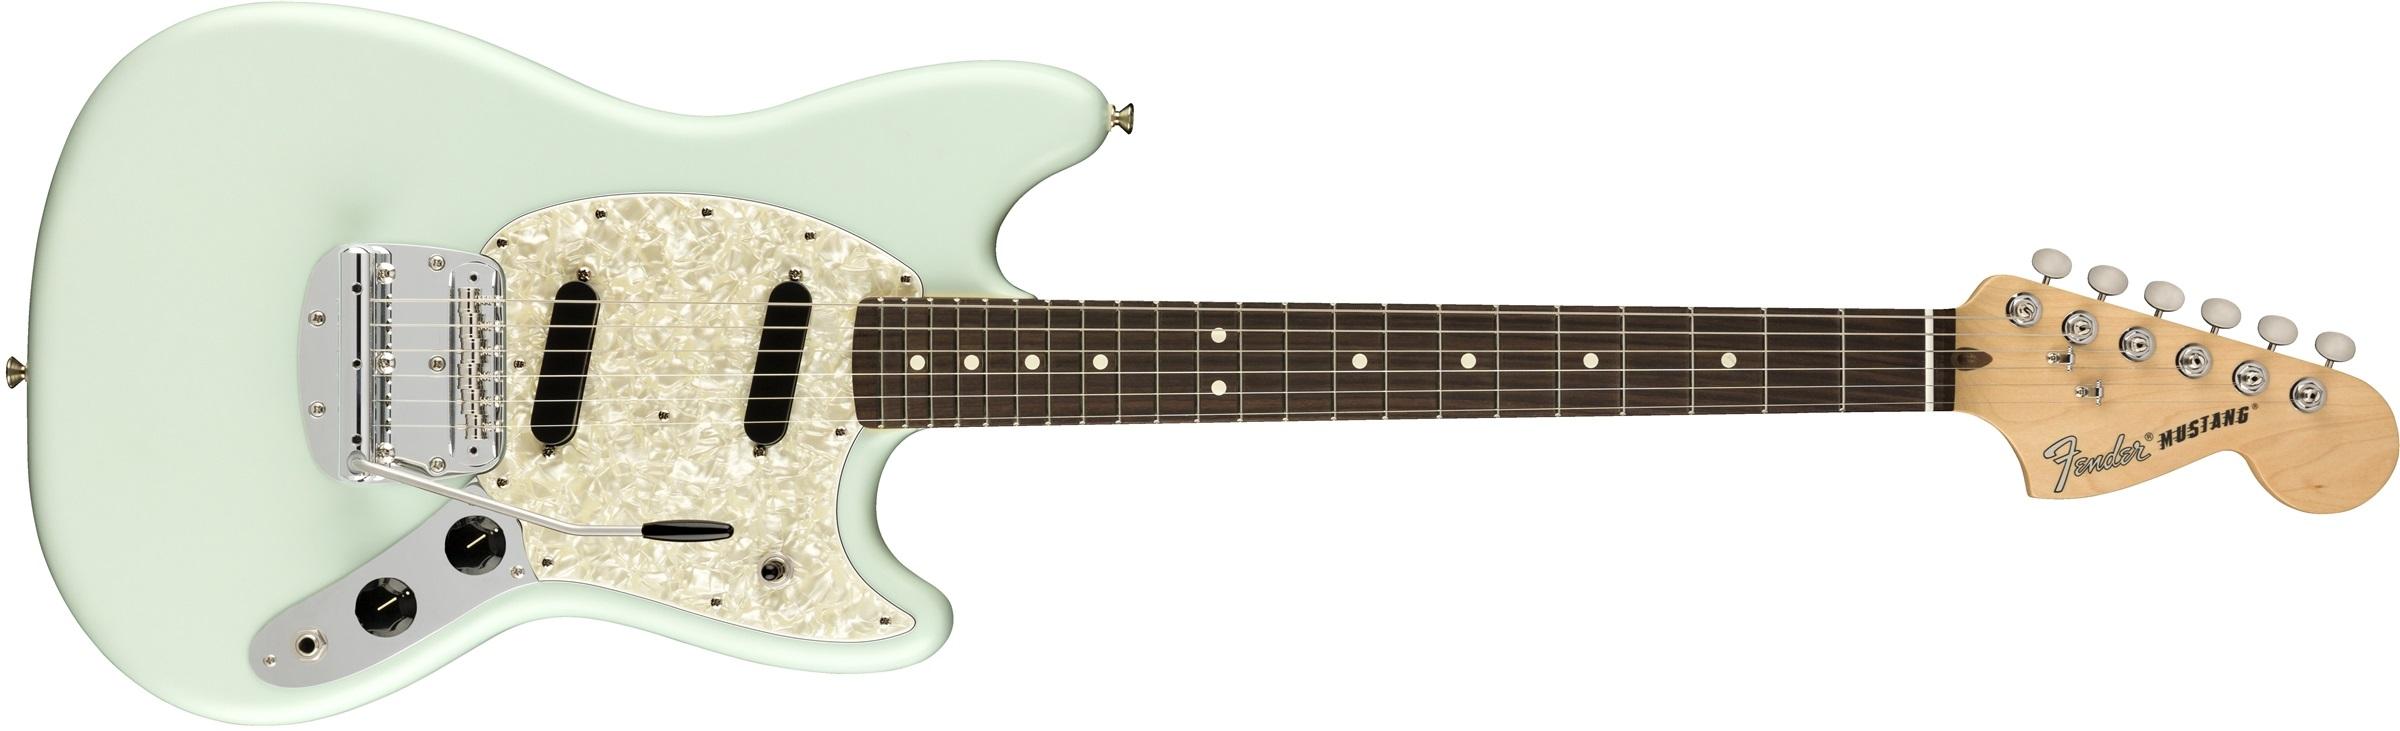 Fender American Performer Mustang RW Satin SBL